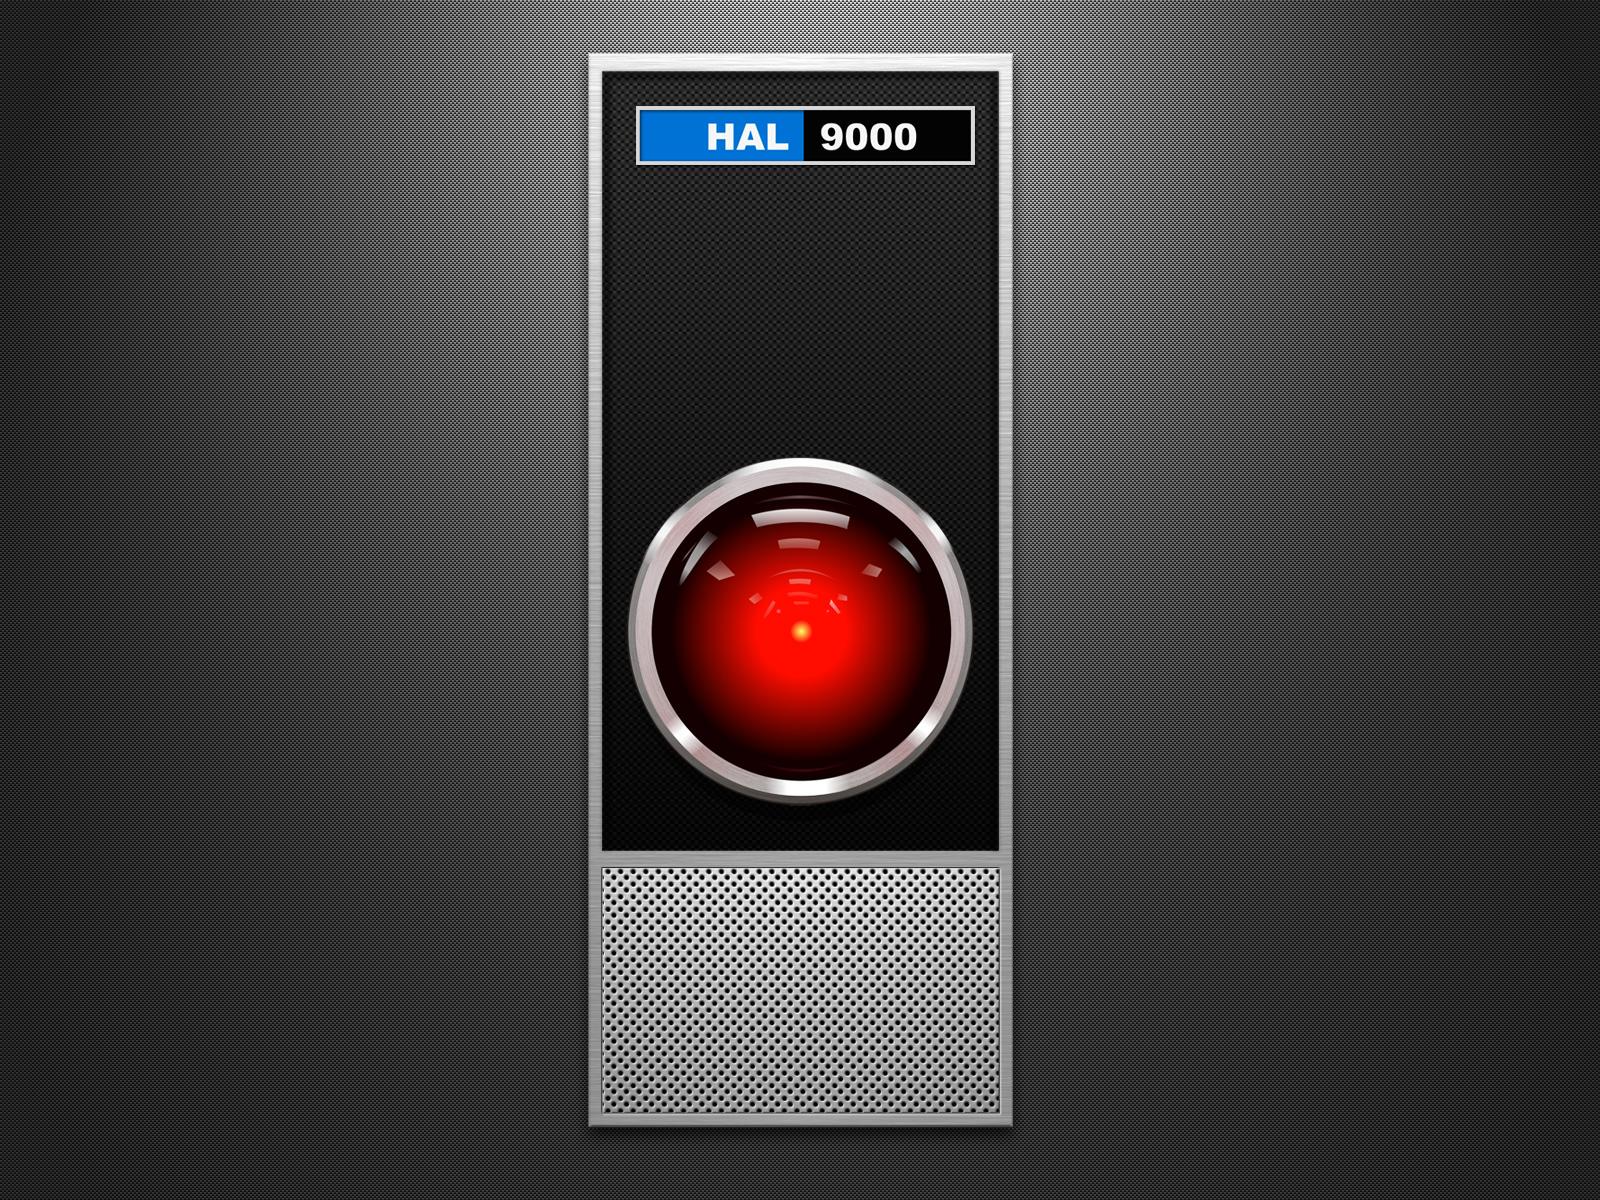 HAL 9000 by JyriK 1600x1200